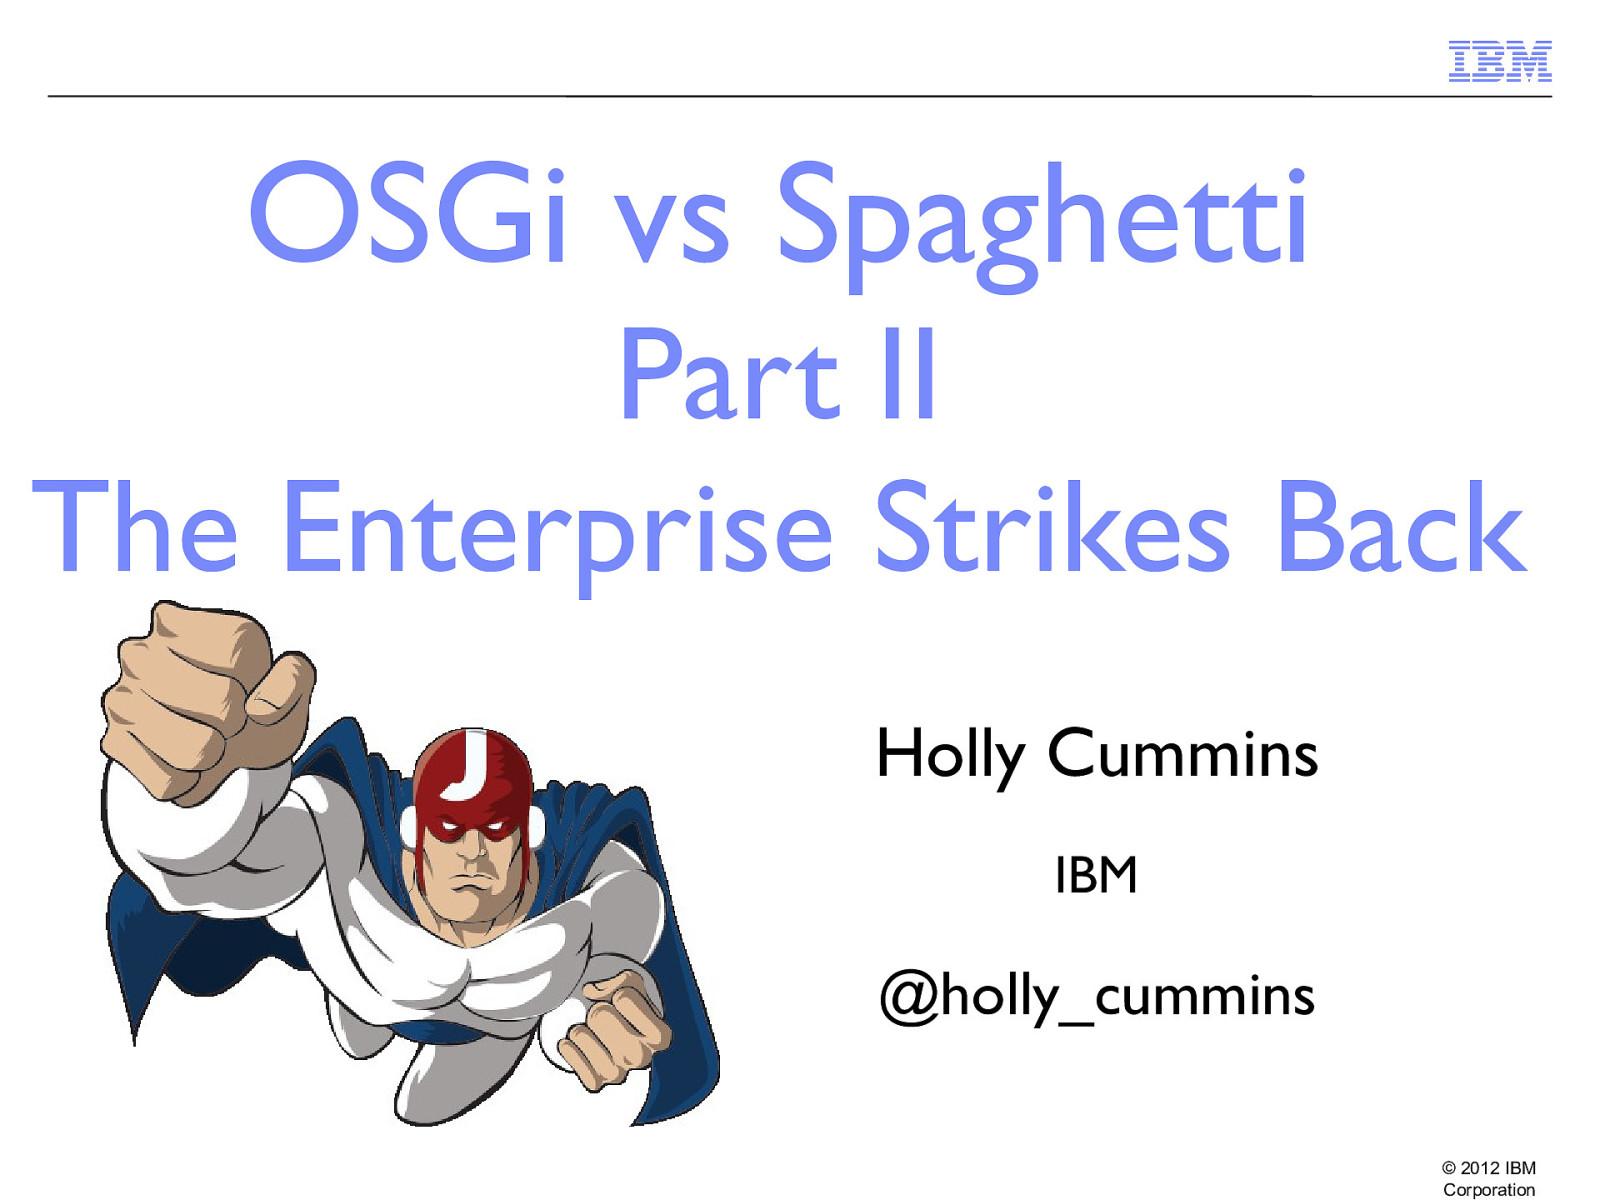 OSGi vs Spaghetti - Part II, The Enterprise strikes back